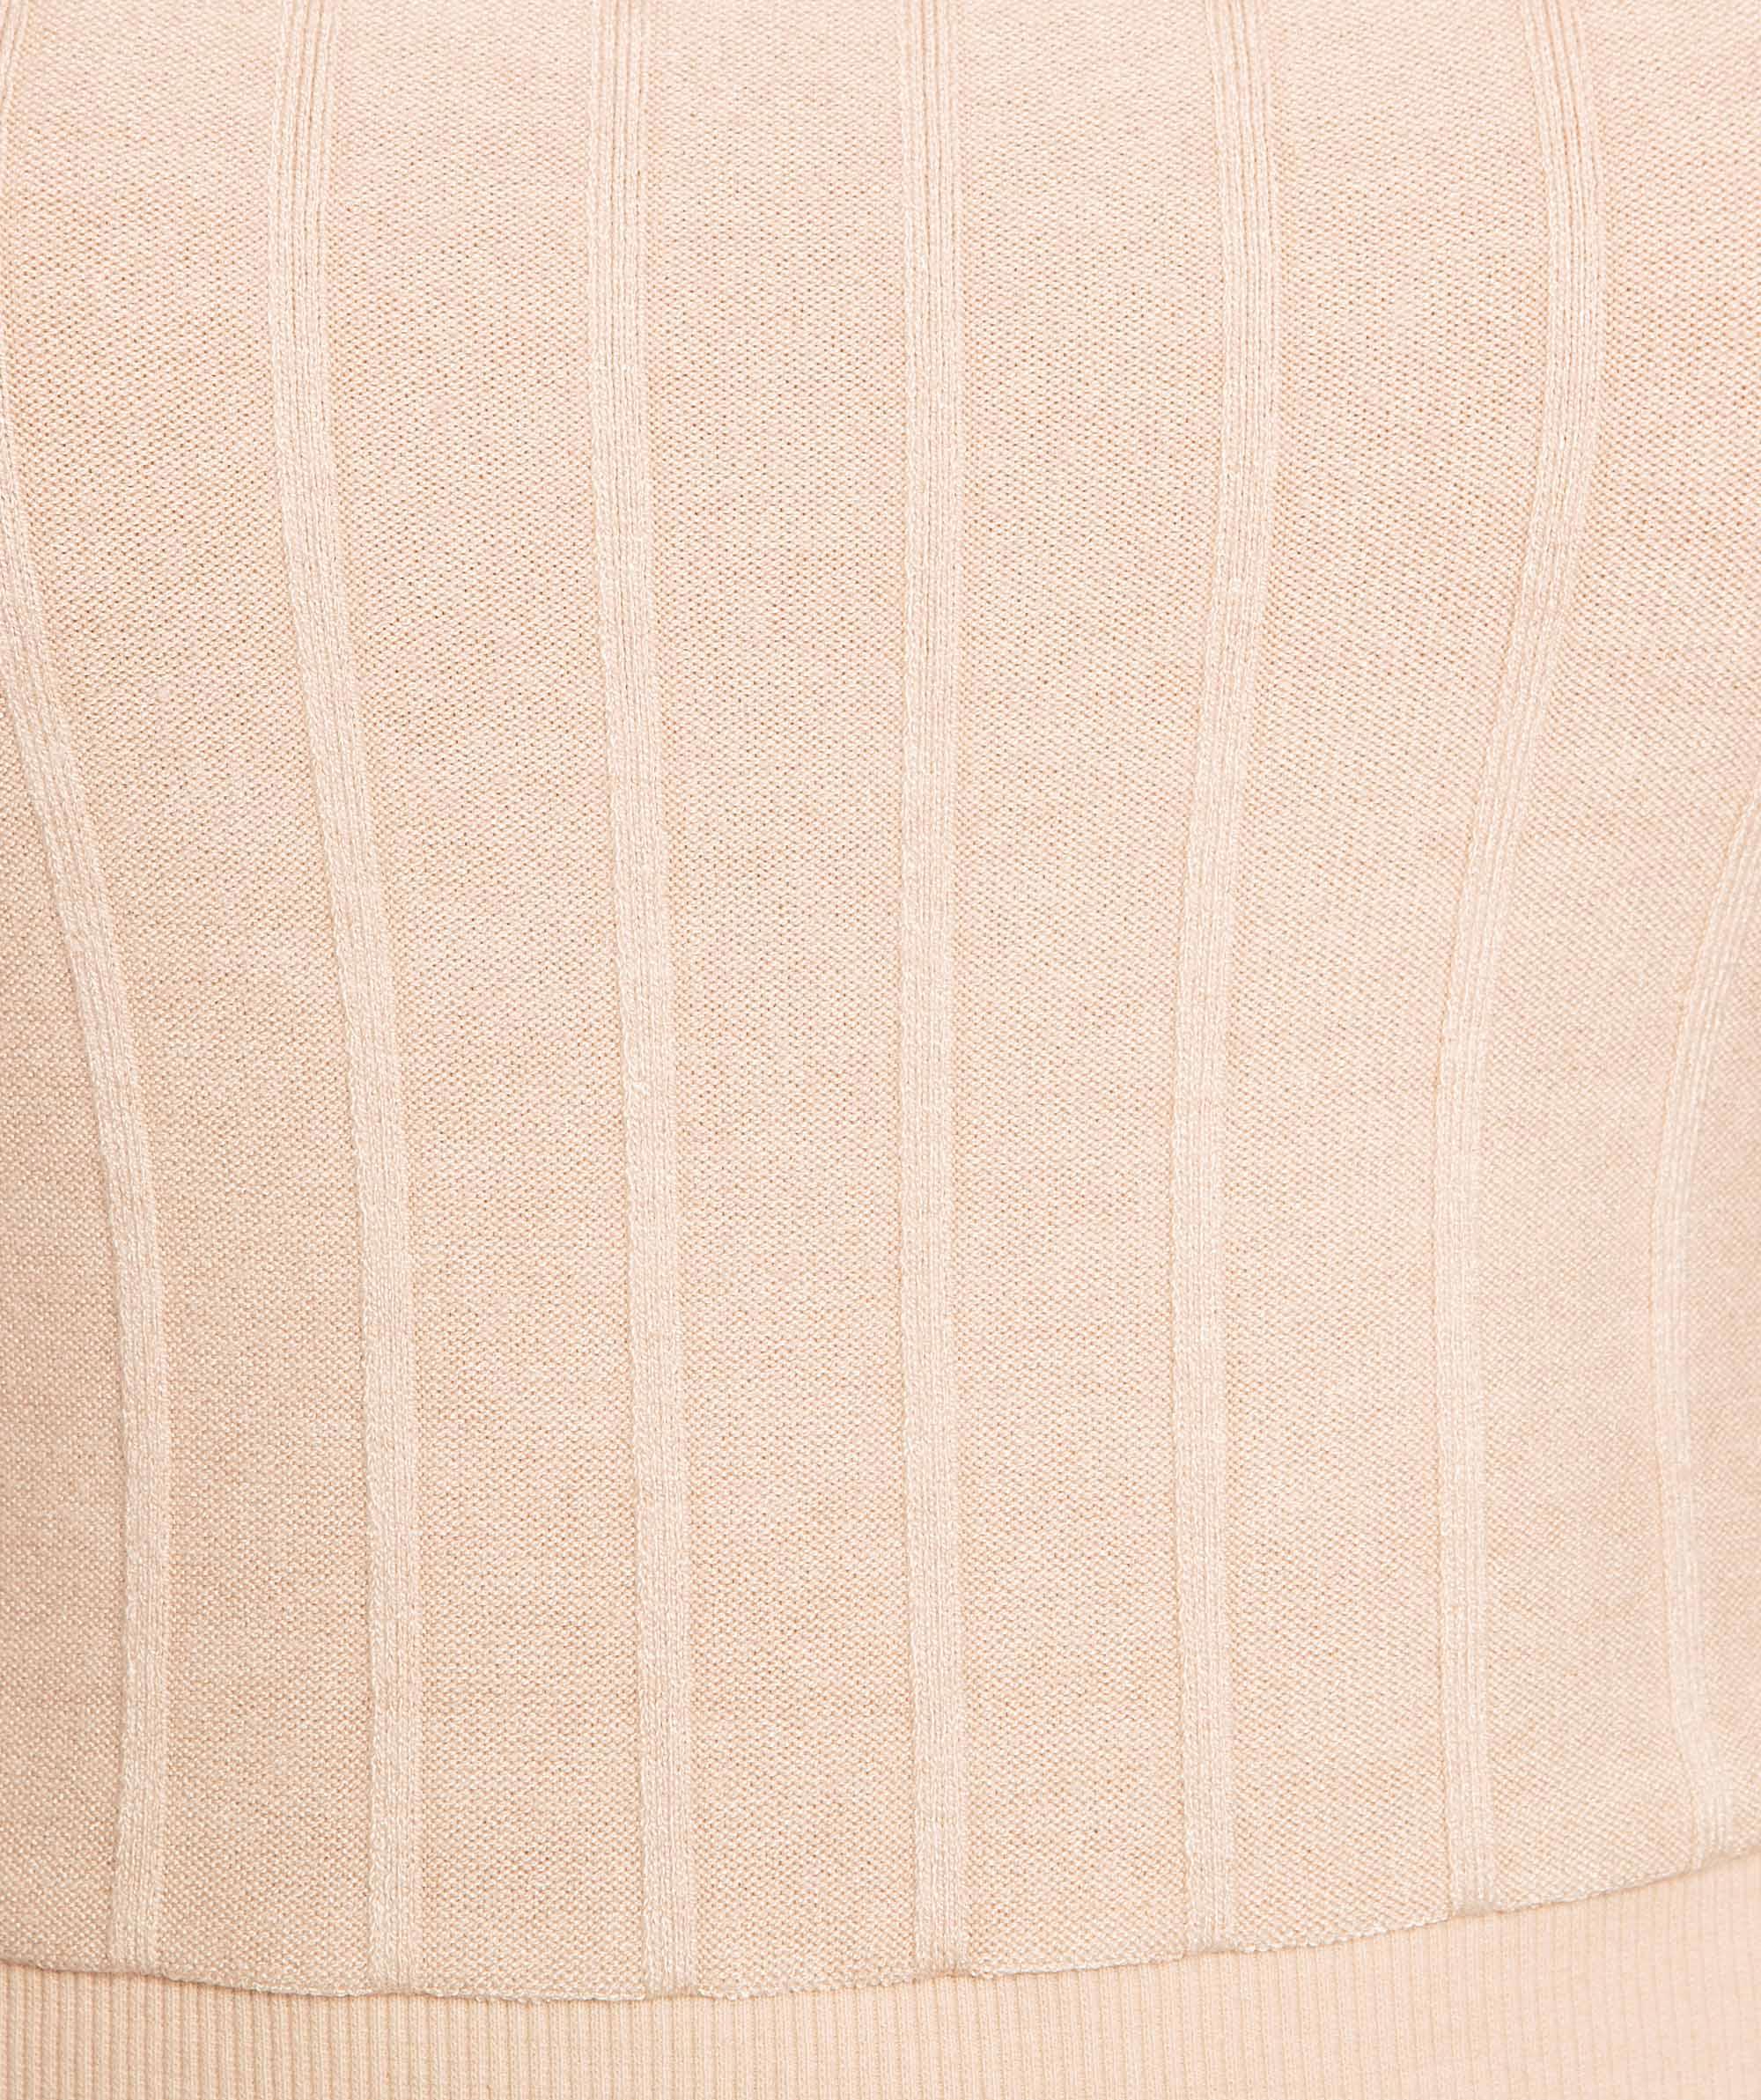 Harper Cropped Cami - Oatmeal